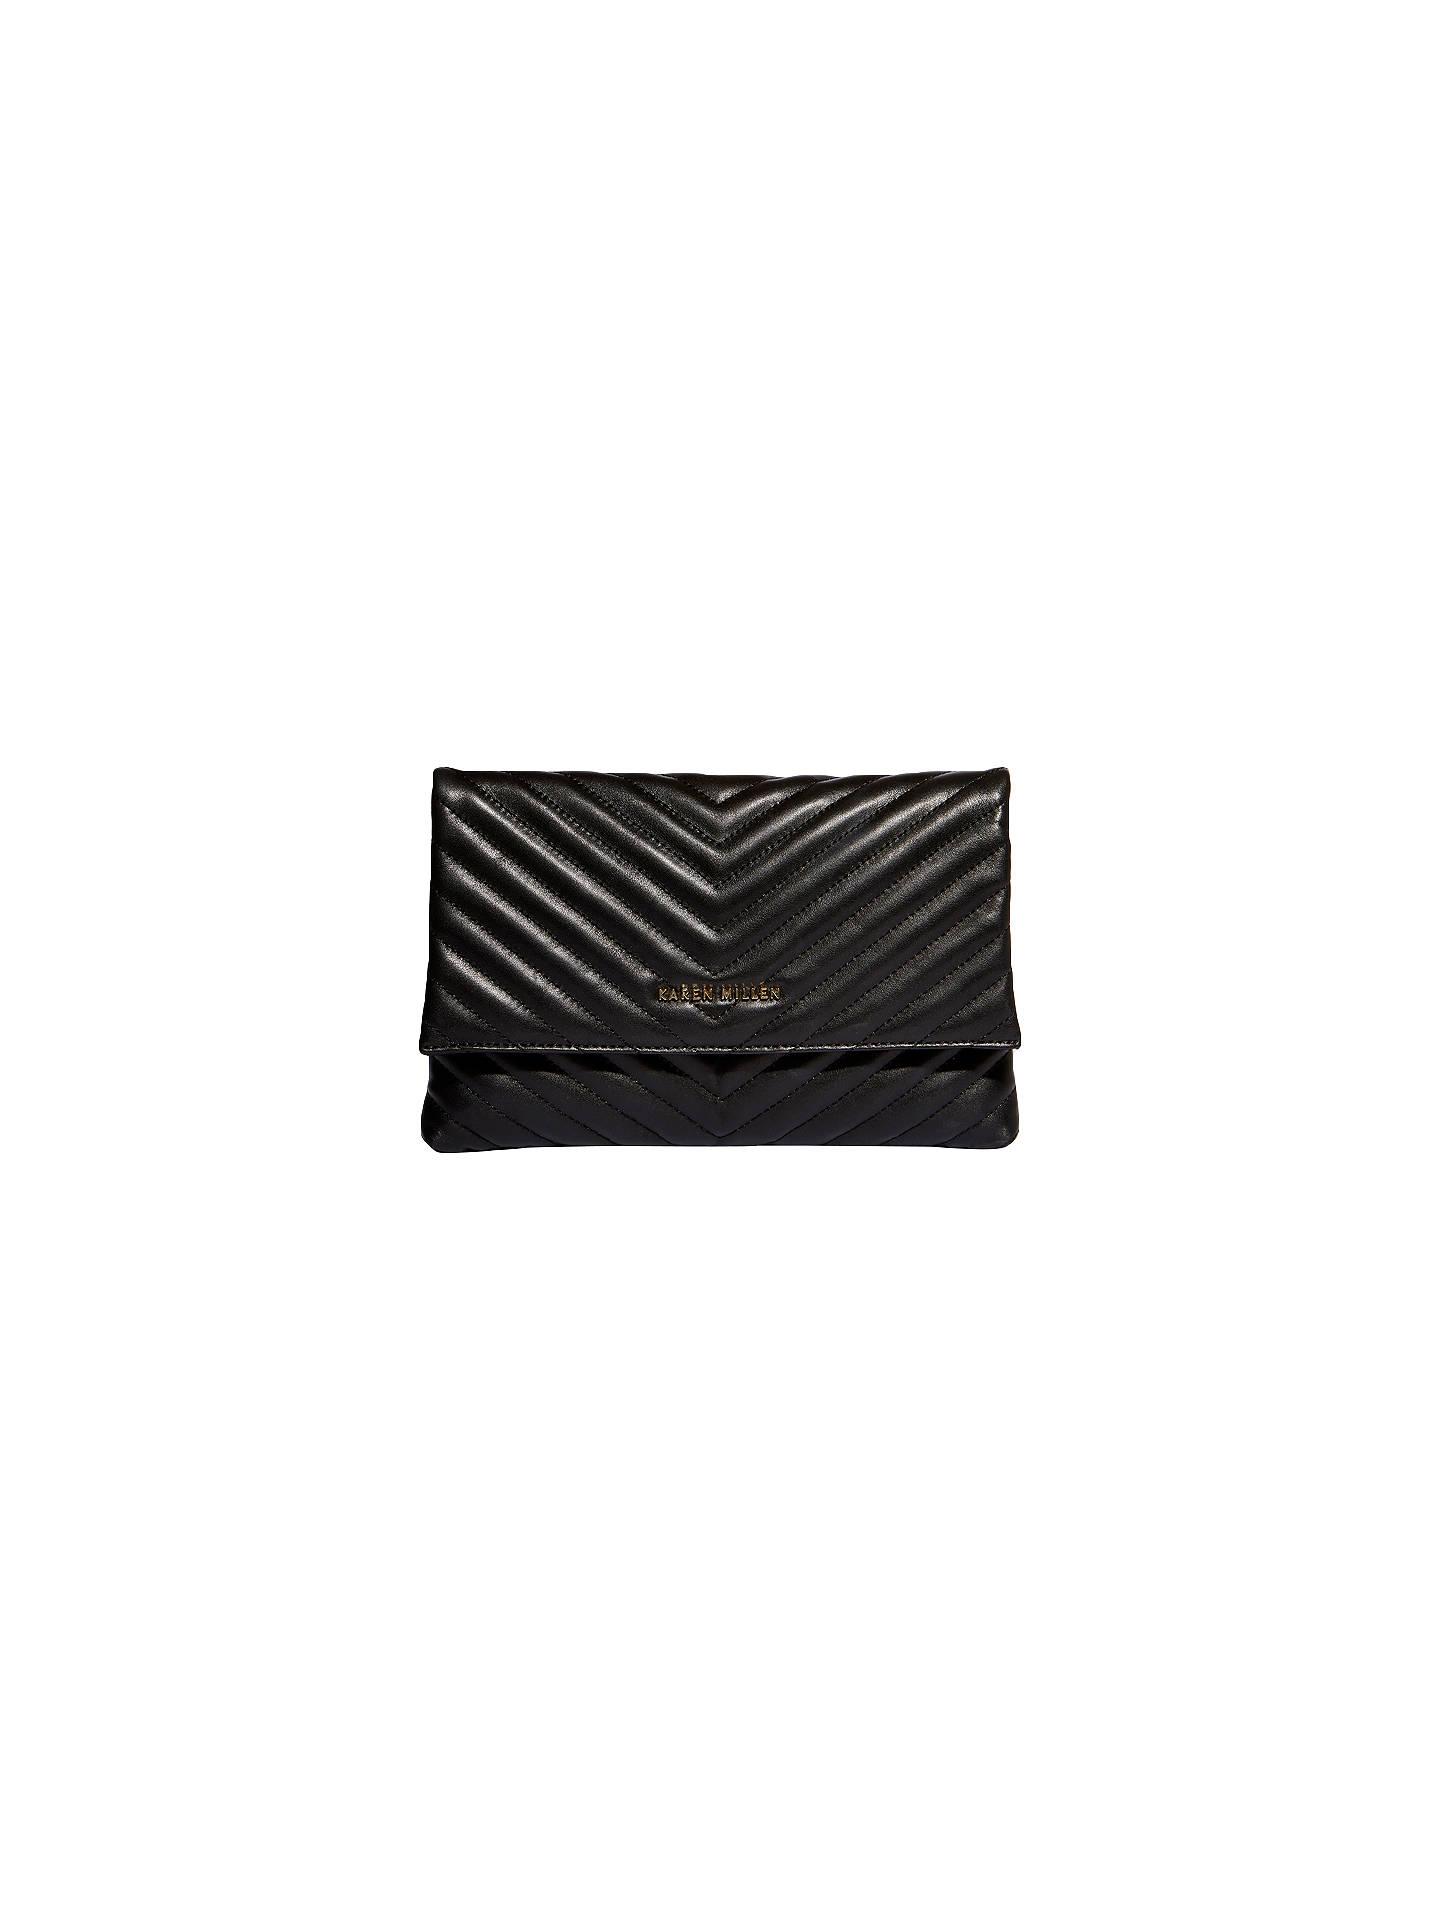 183d9033a09 Buy Karen Millen Leather Quilted Brompton Bag, Black Online at  johnlewis.com ...